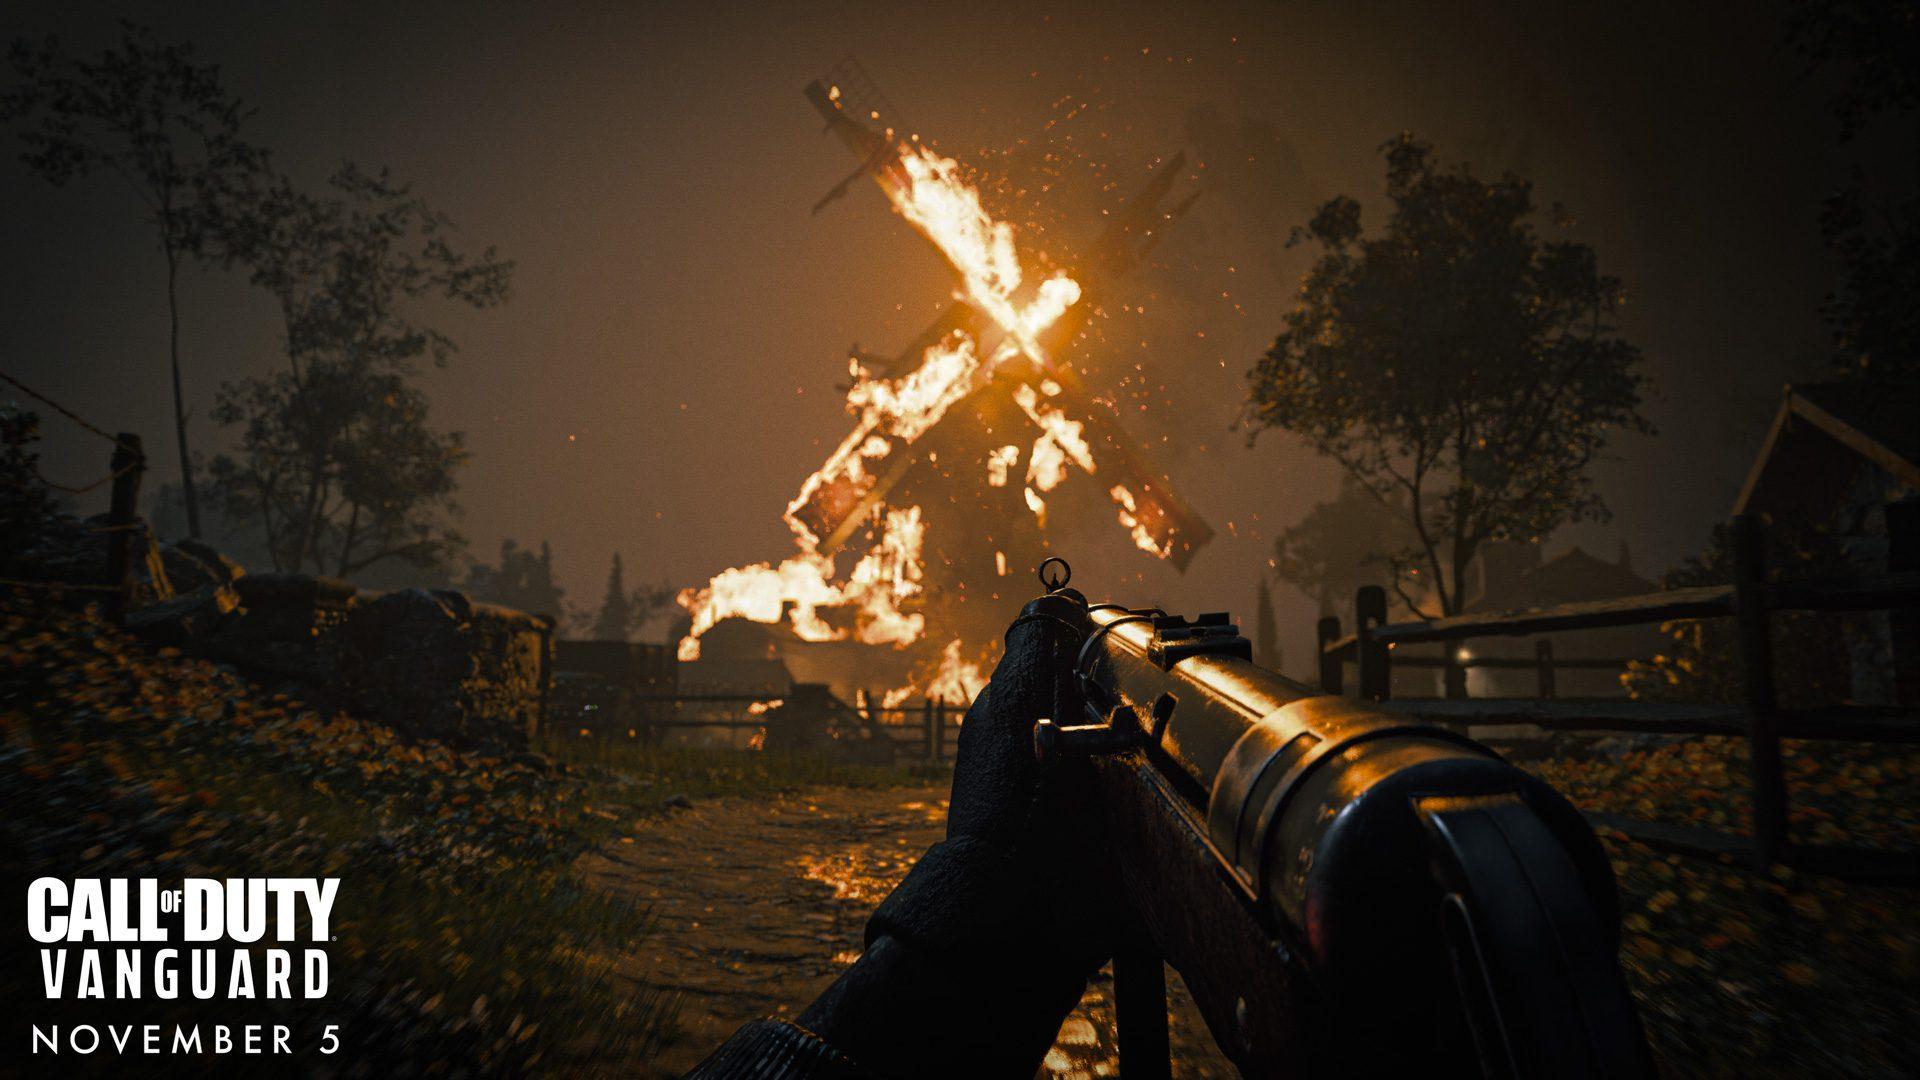 call of duty vanguard beta release date